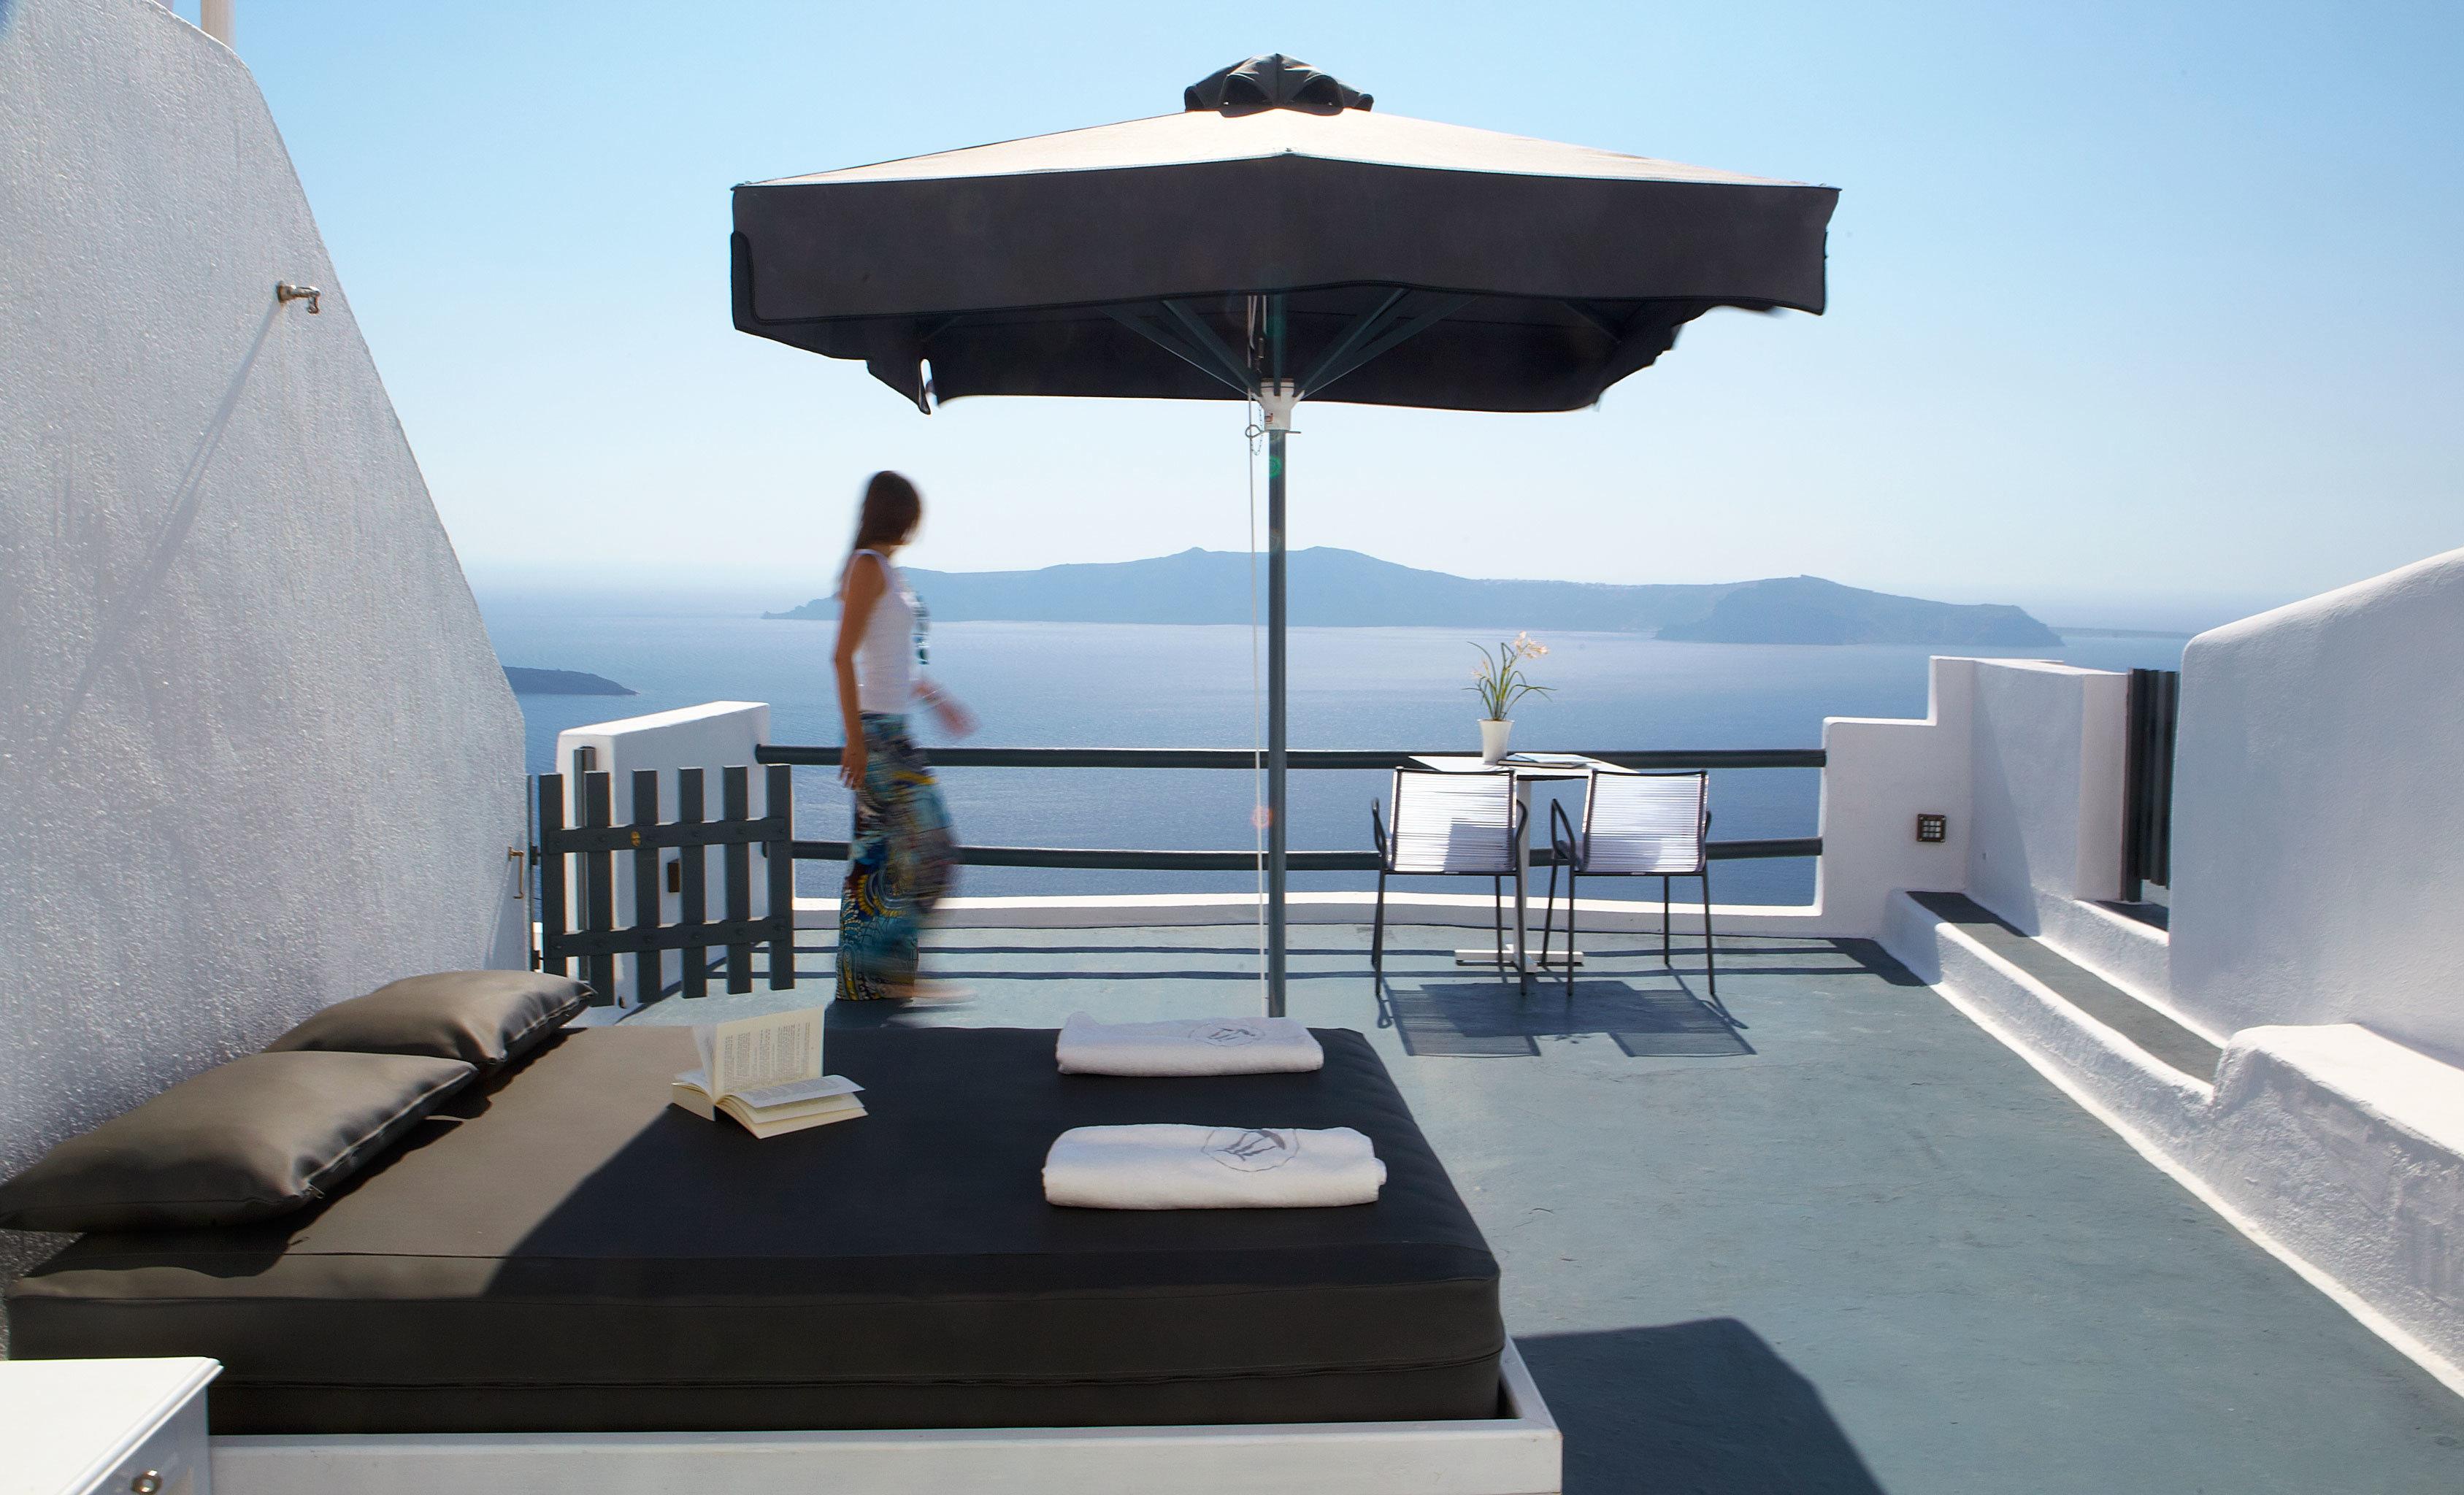 Balcony Beachfront Romantic Scenic views sky property yacht Villa passenger ship swimming pool outdoor structure vehicle